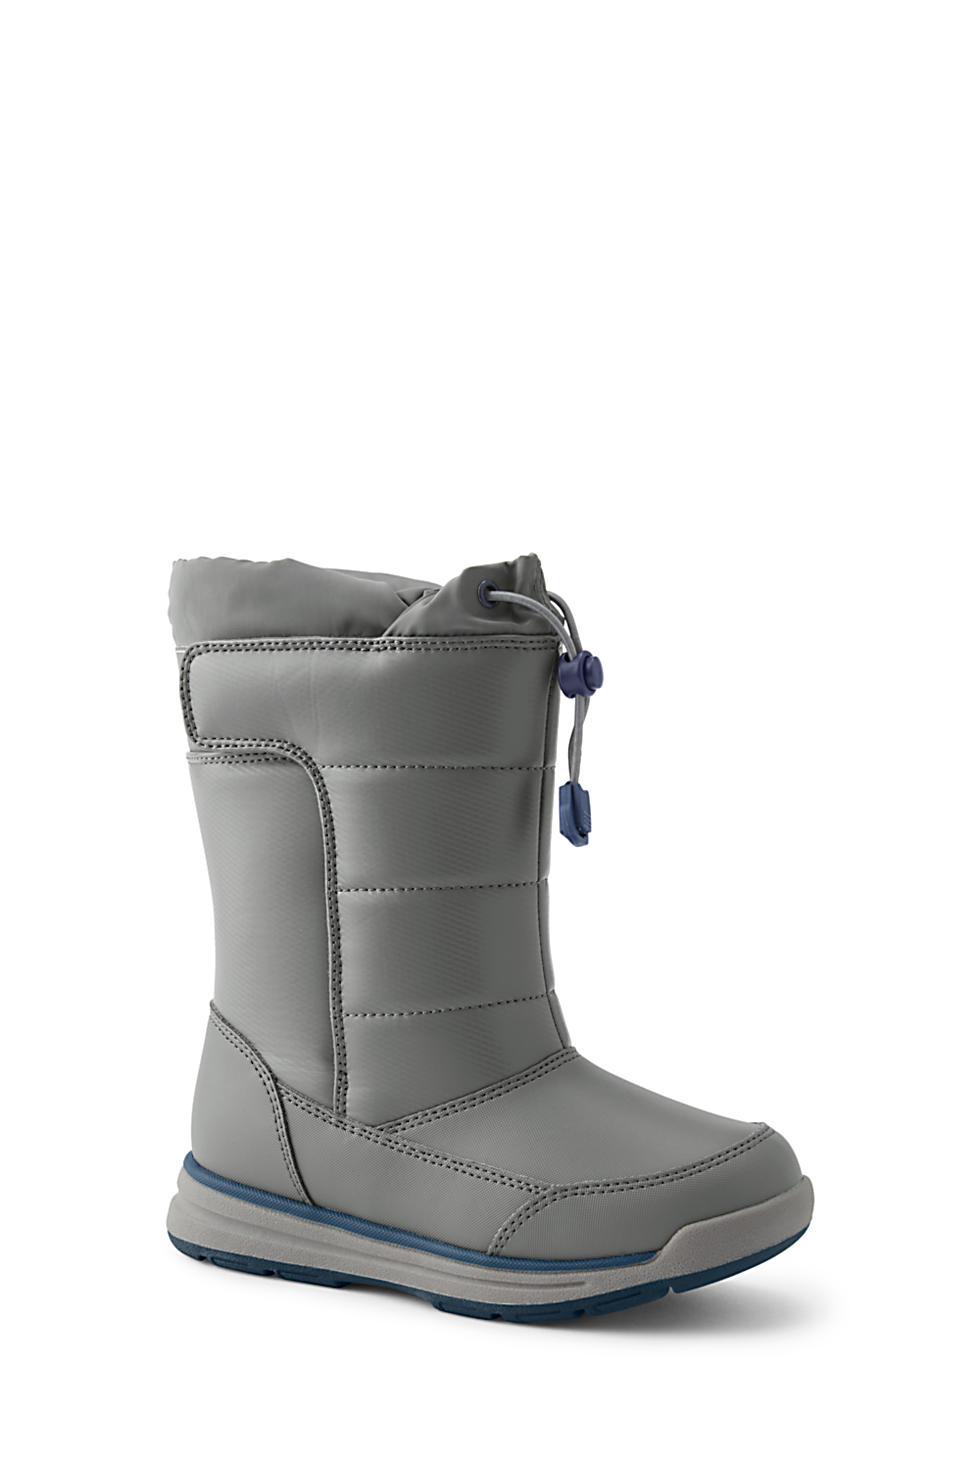 Kids Snow Flurry Winter Boots (various colors)